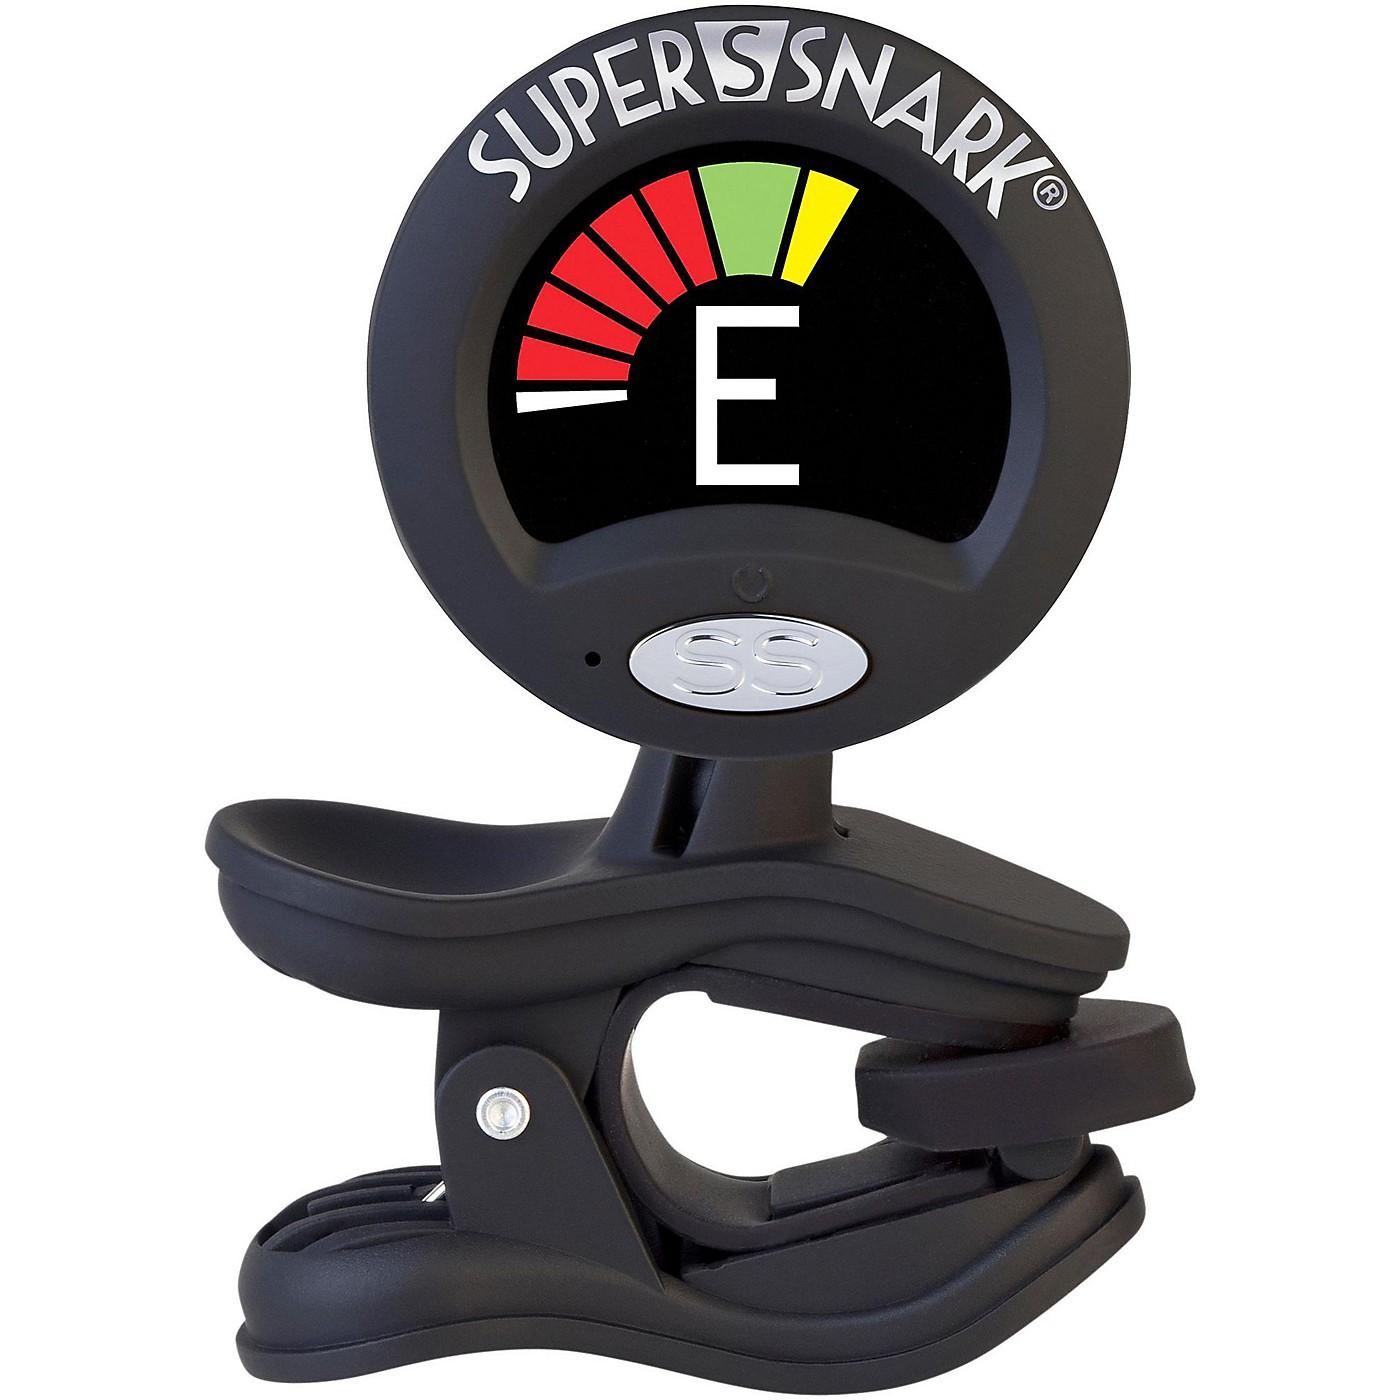 Snark Super Snark 2 Clip-On Tuner thumbnail